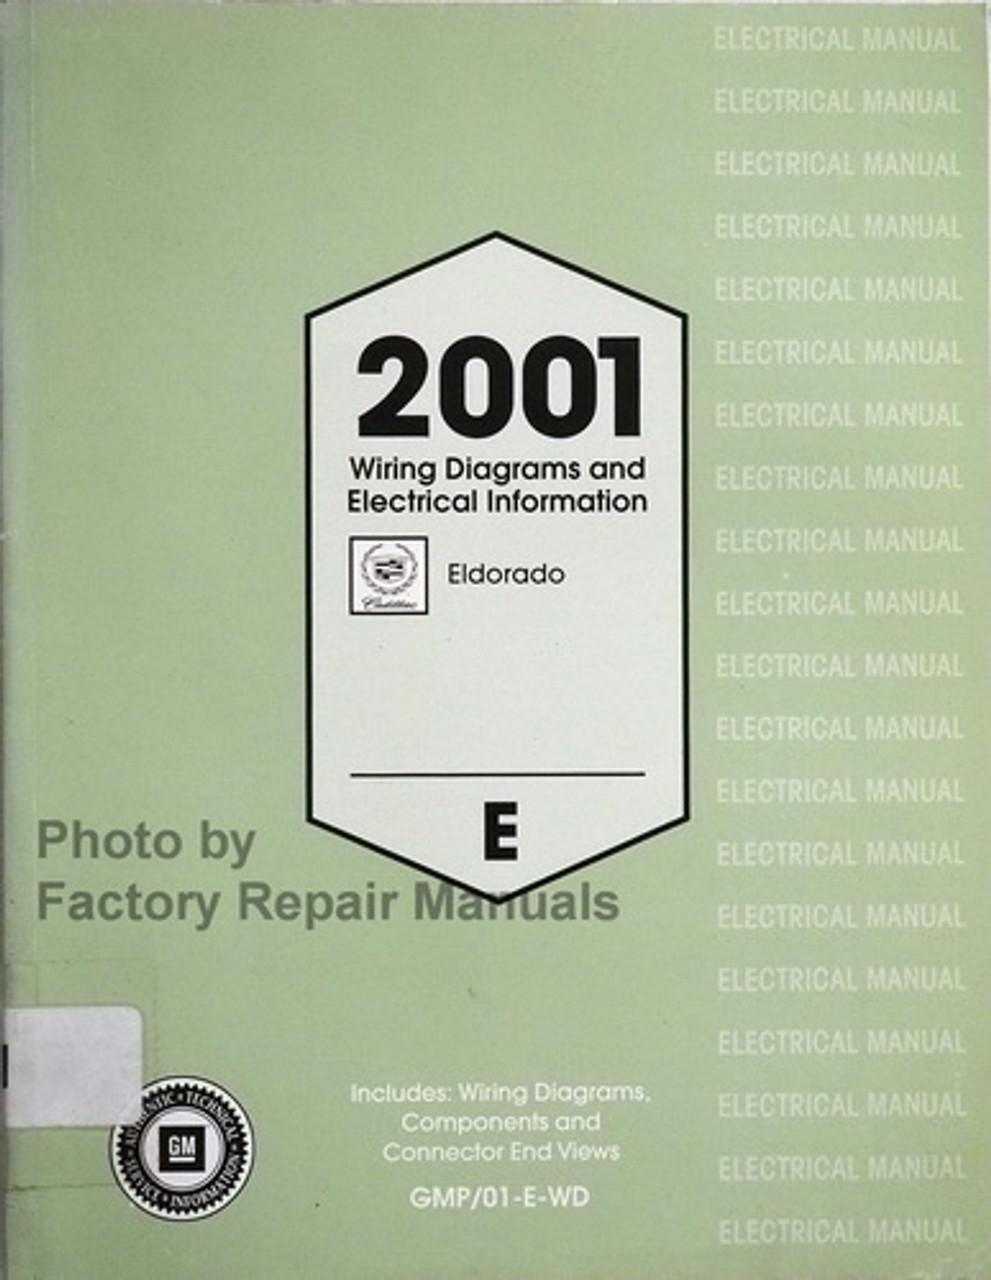 2001 Cadillac Eldorado Wiring Diagrams And Electrical Information Manual Original Factory Repair Manuals